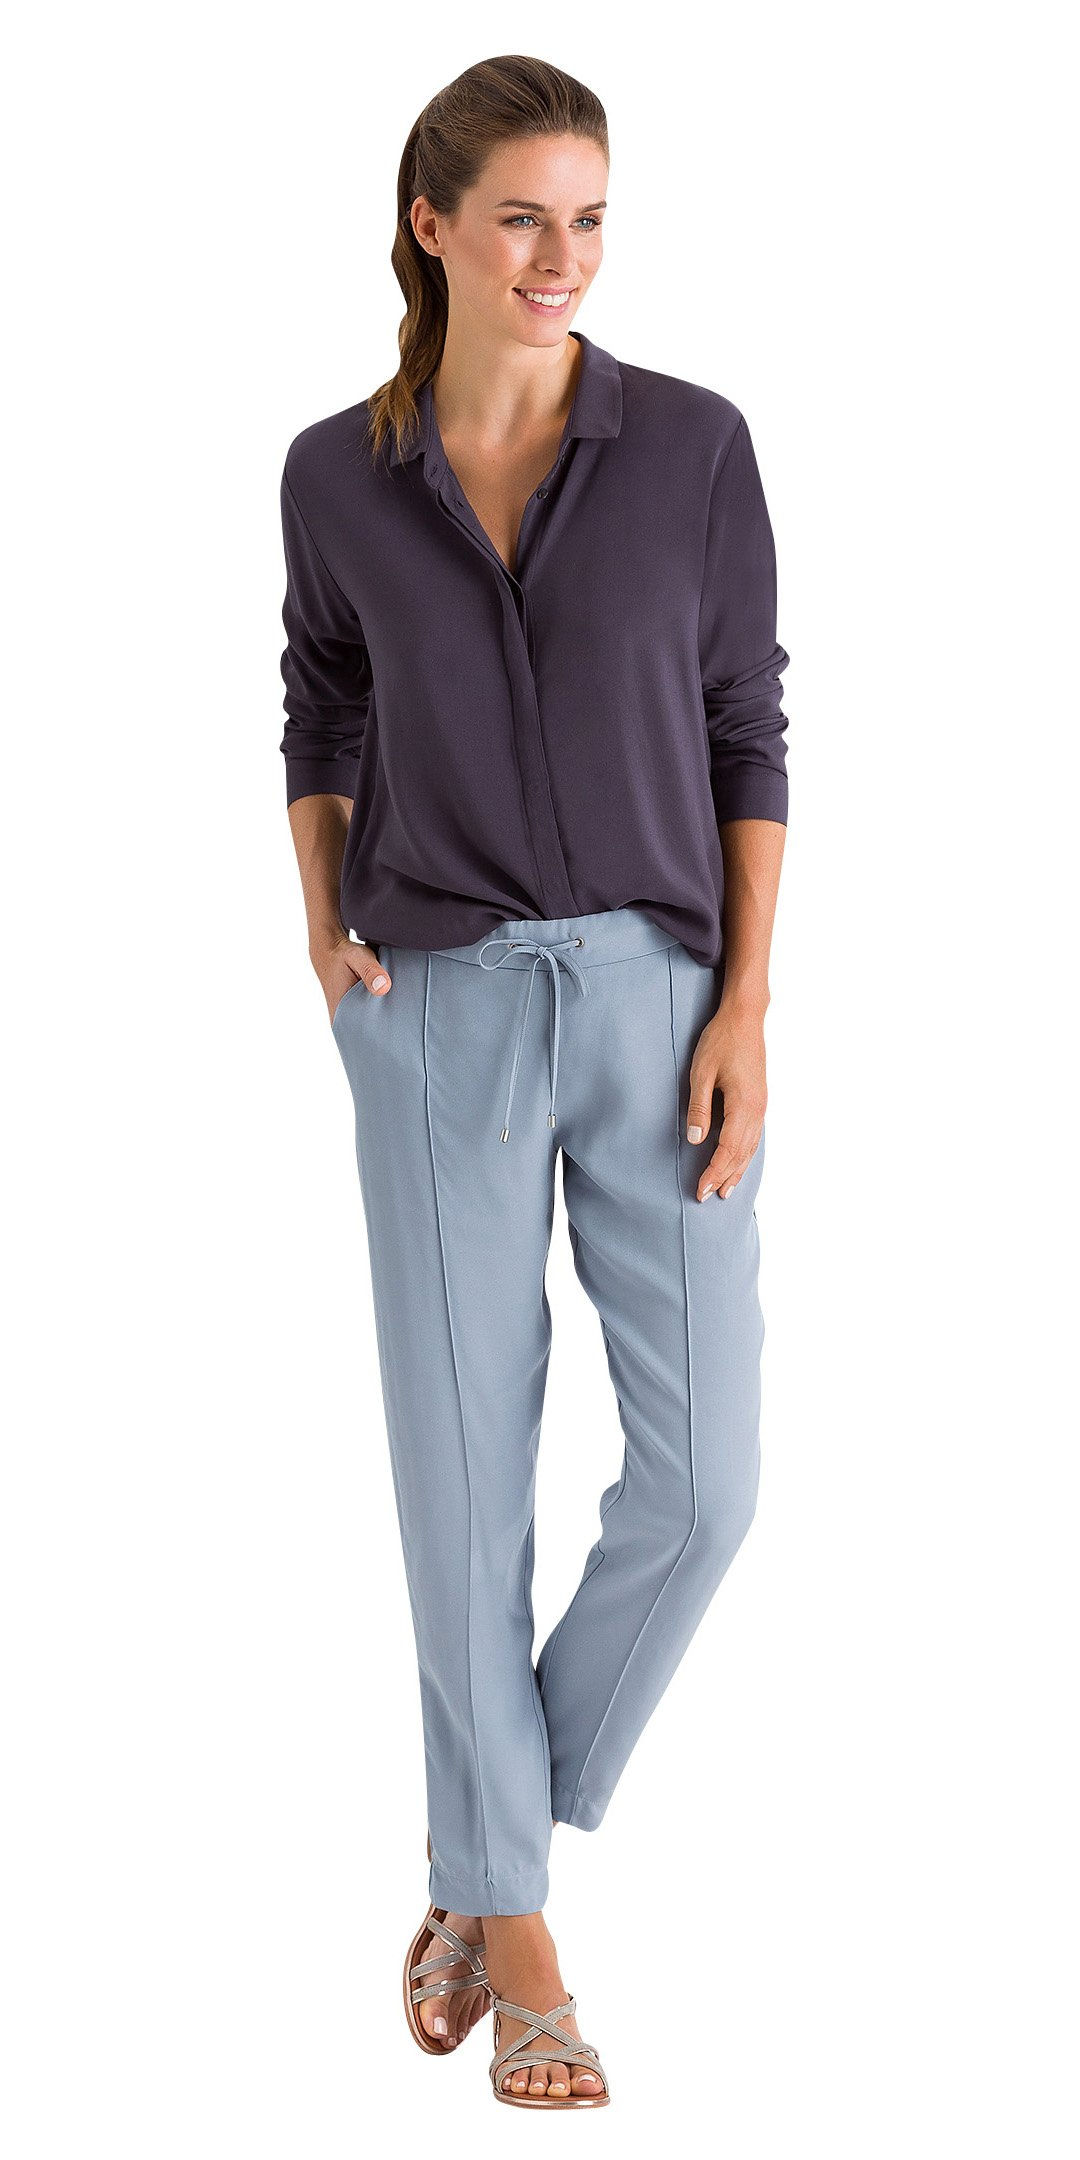 HANRO Women's Favourites Long Sleeve Shirt, Elder, Large